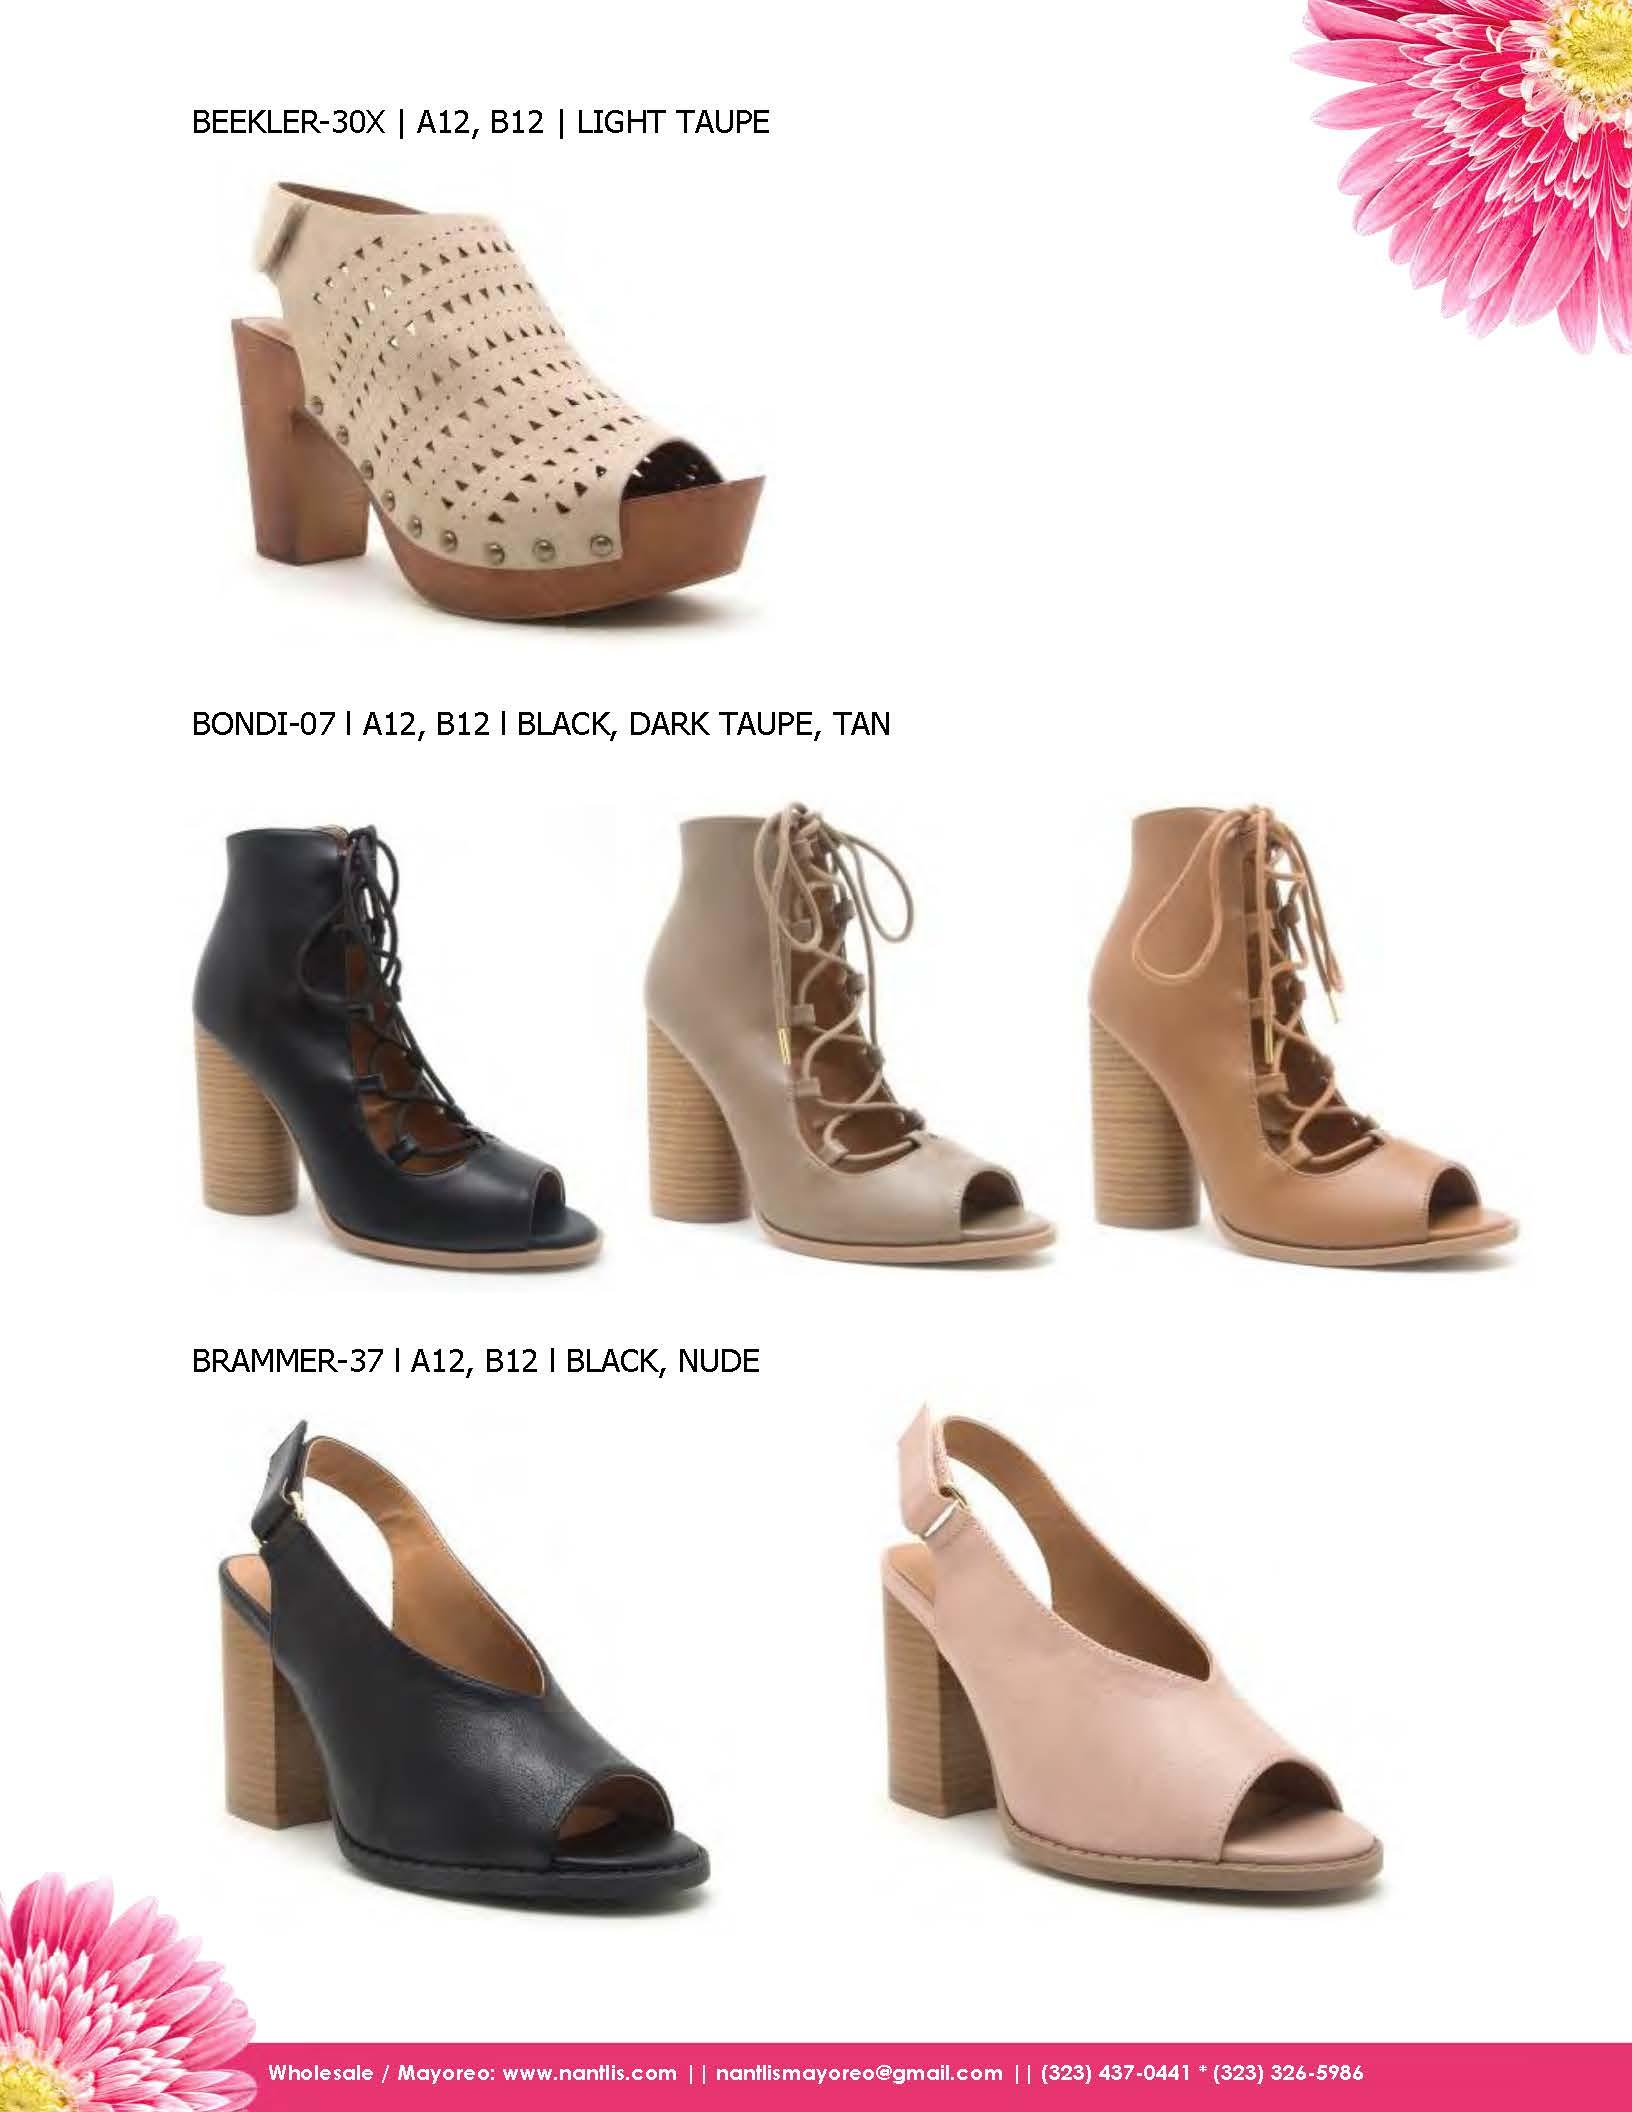 Nantlis Vol QU43 Zapatos para mujer mayoreo Wholesale shoes for women_Page_06